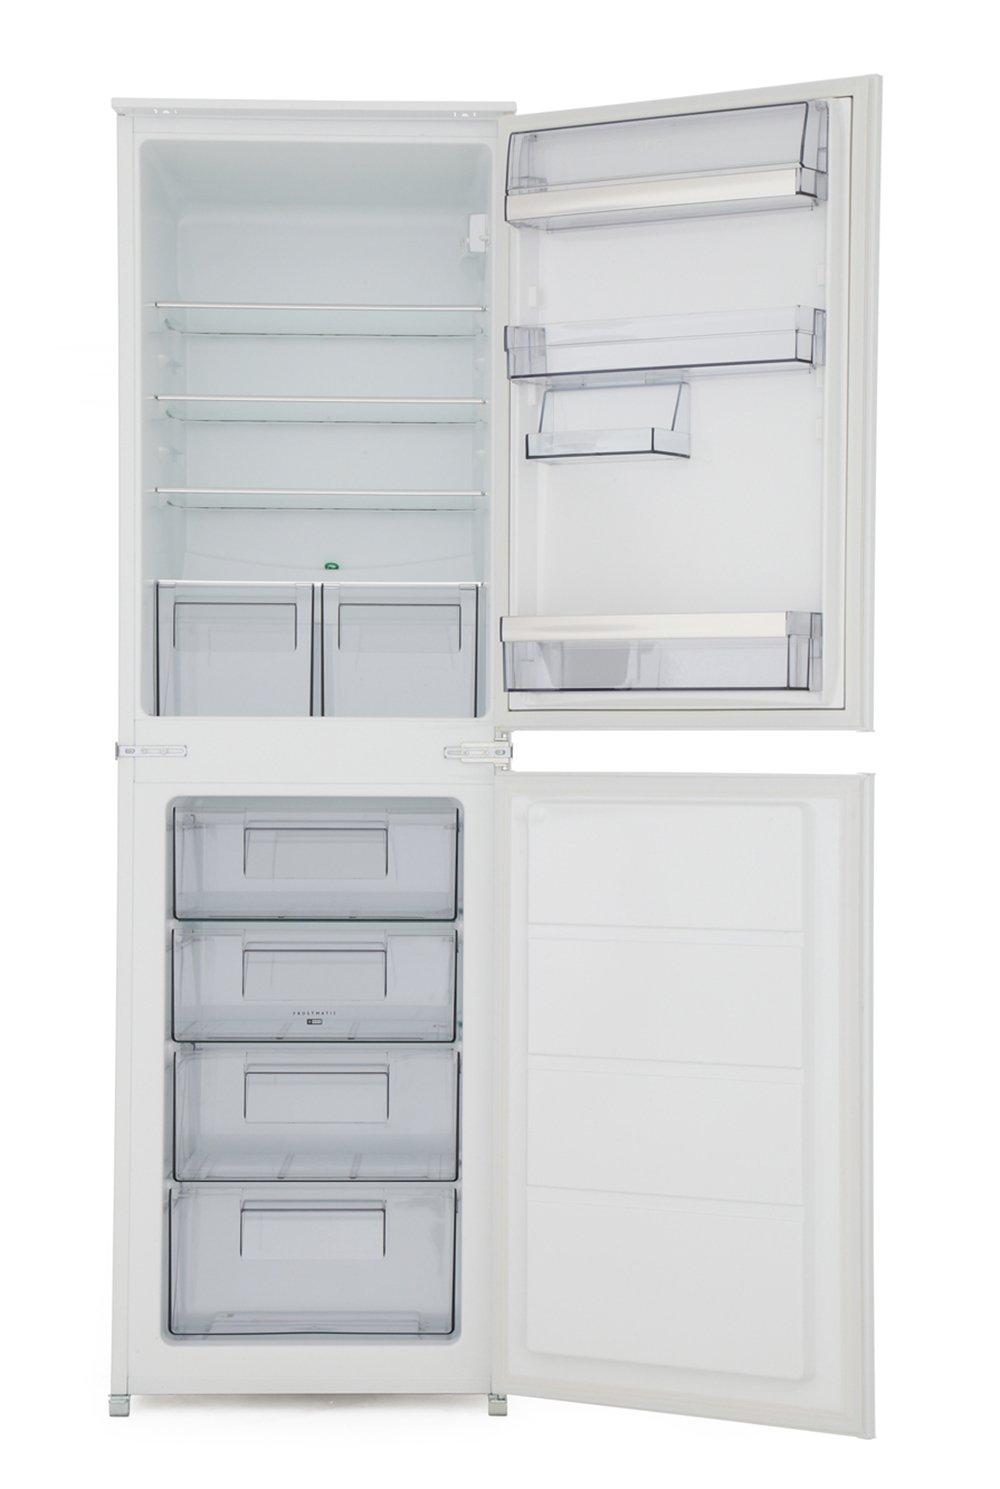 AEG SCB6181VLS Low Frost Integrated Fridge Freezer